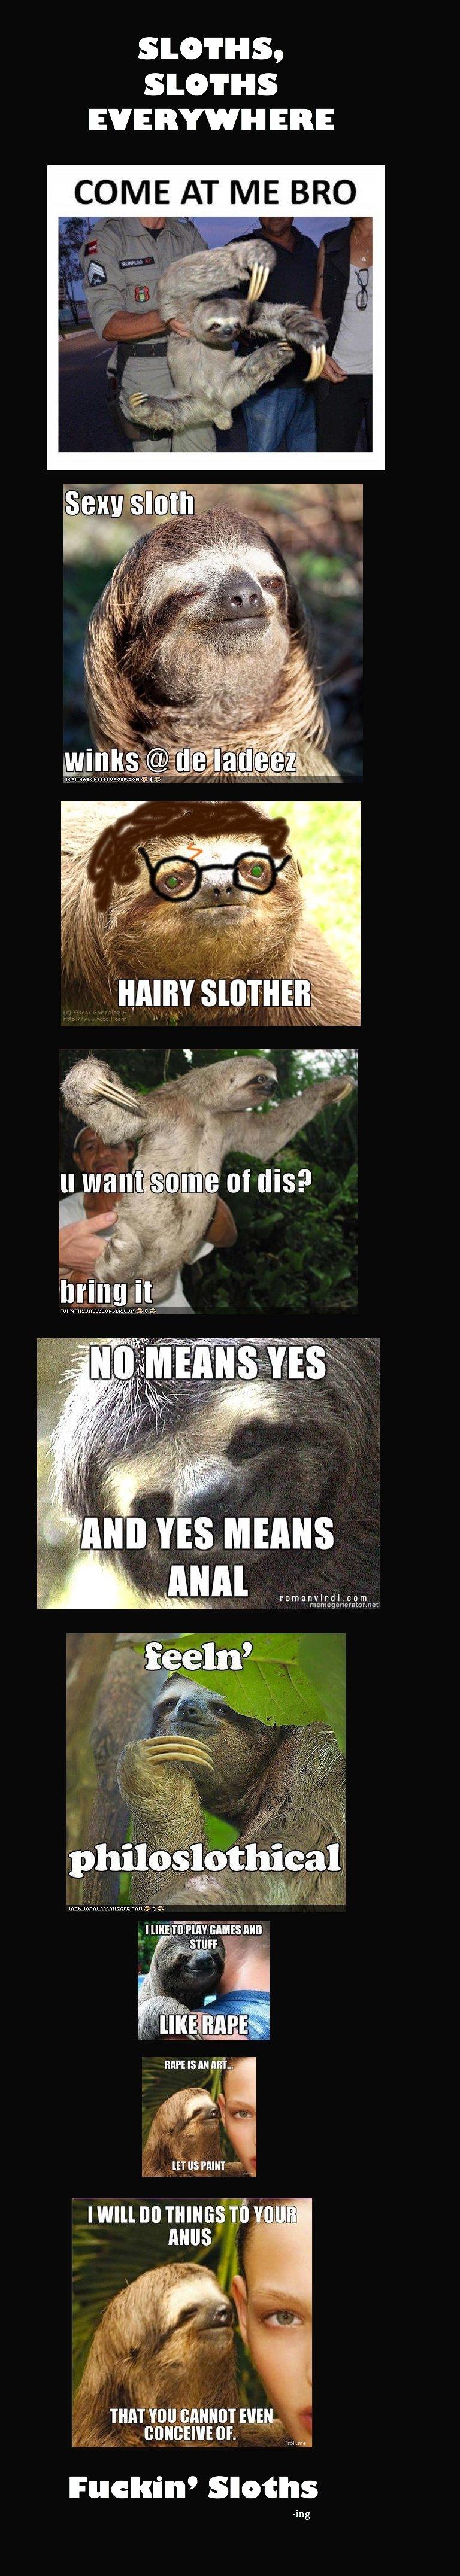 Sloths.. THEY DERK AR DURRR. dickbutt dedz to pheel. Elli COME AT ME BRO I WE P FUN cums Mo RAPE IS an Mi... manna! mm no mimitw mu ANUS THAT VIII] NEIL, Sleuth